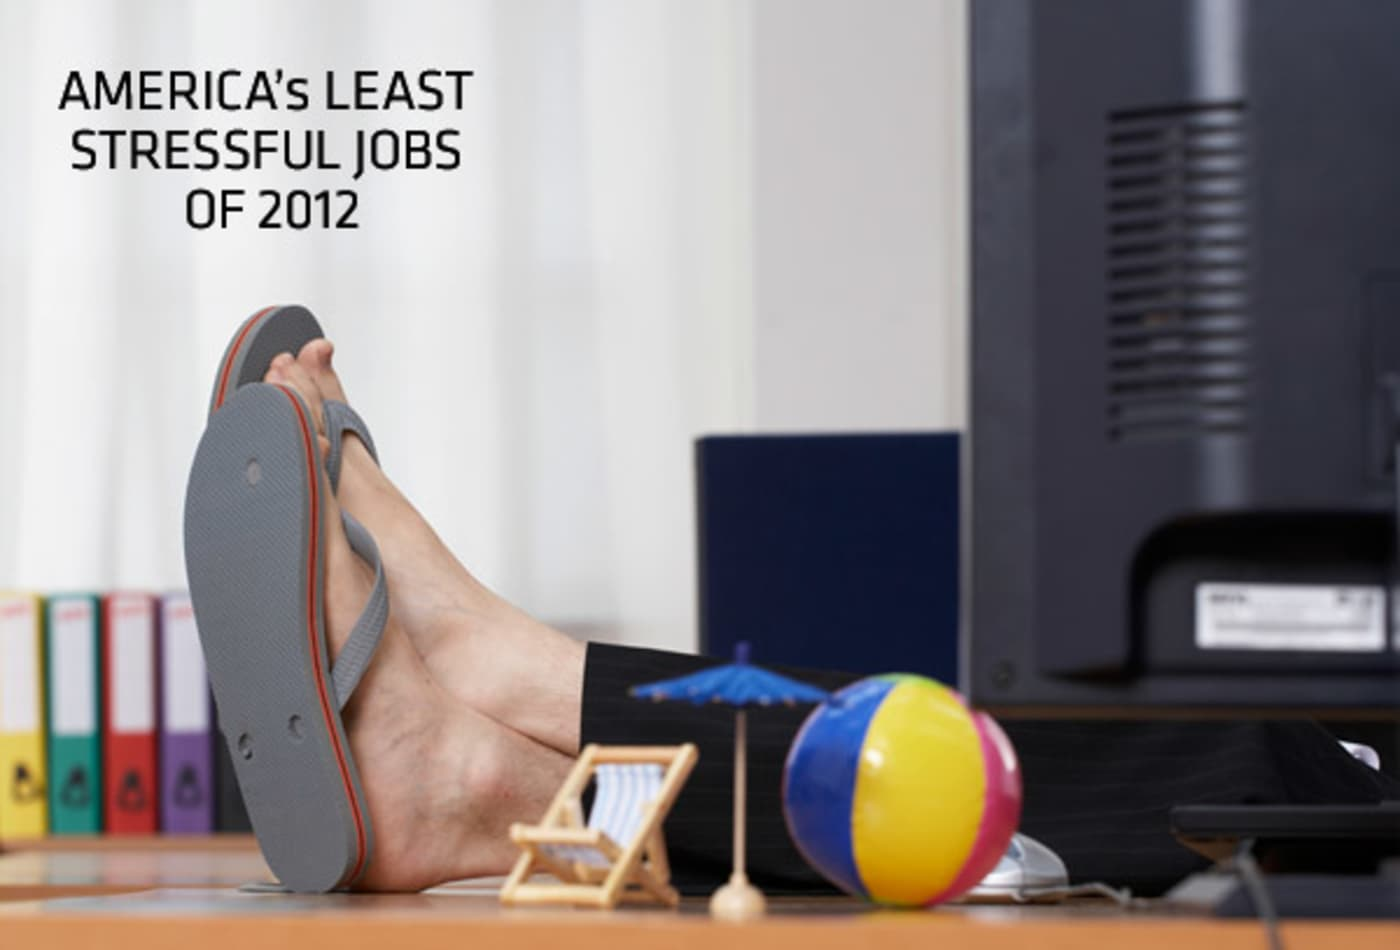 Least-stressful-jobs-cover2.jpg